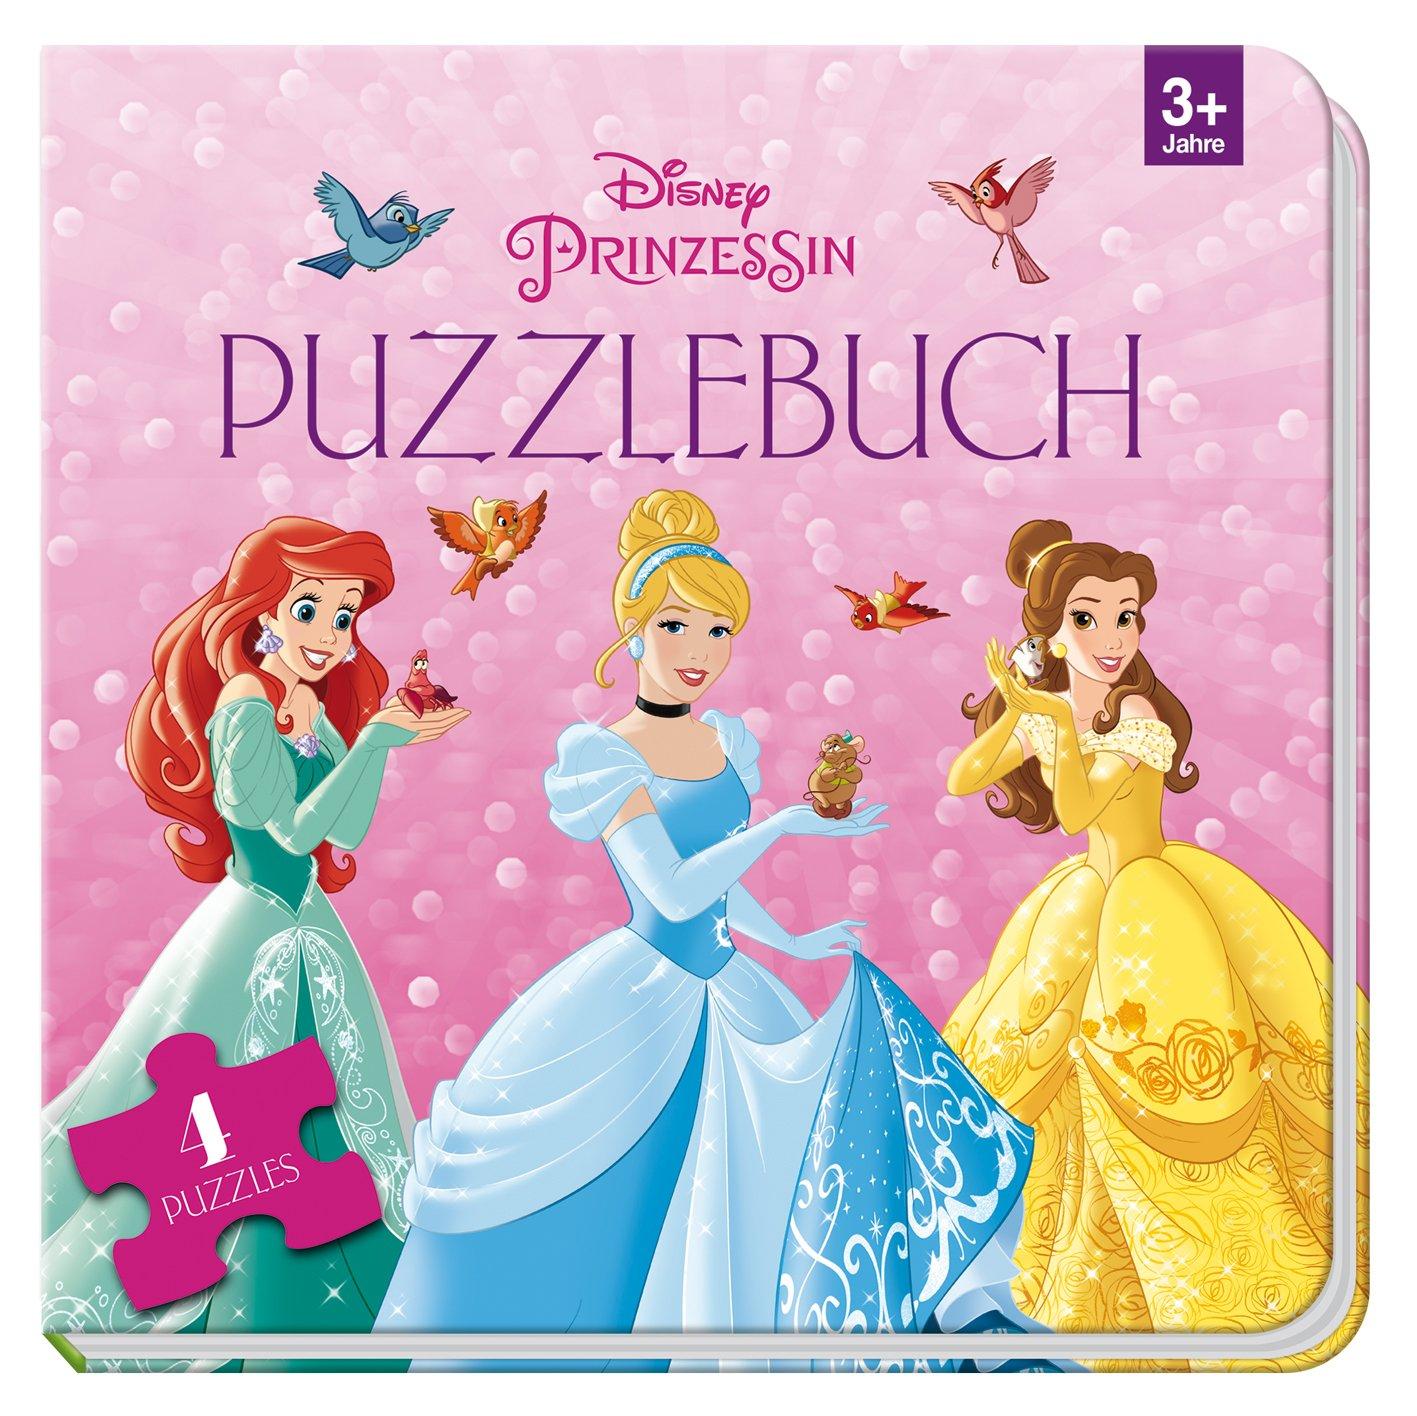 Puzzlebuch Disney Prinzessin